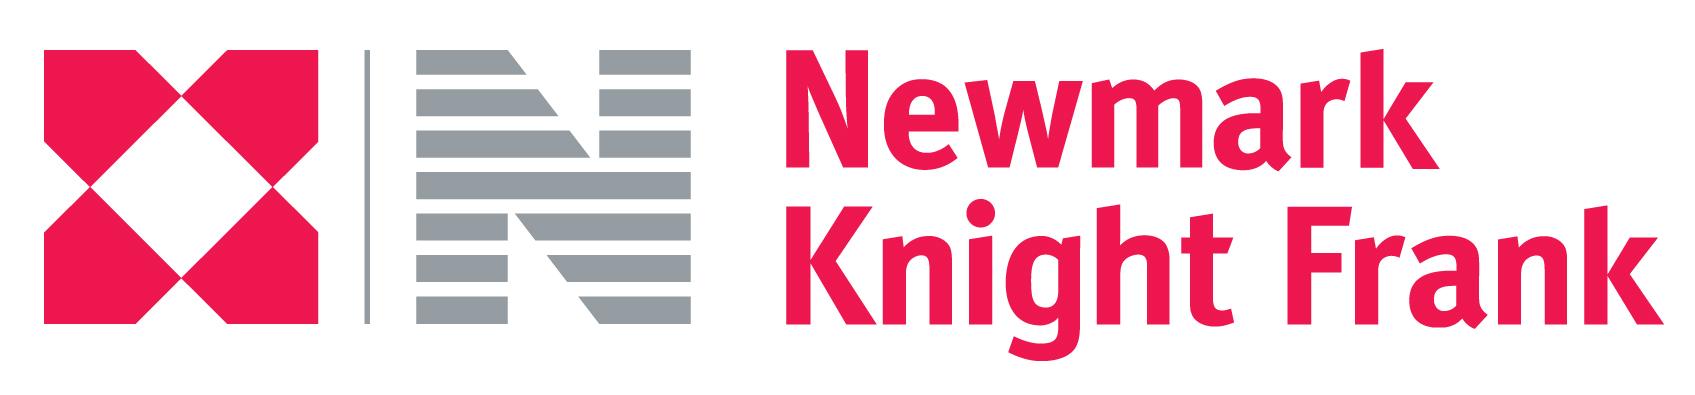 Newmark Knight Frank